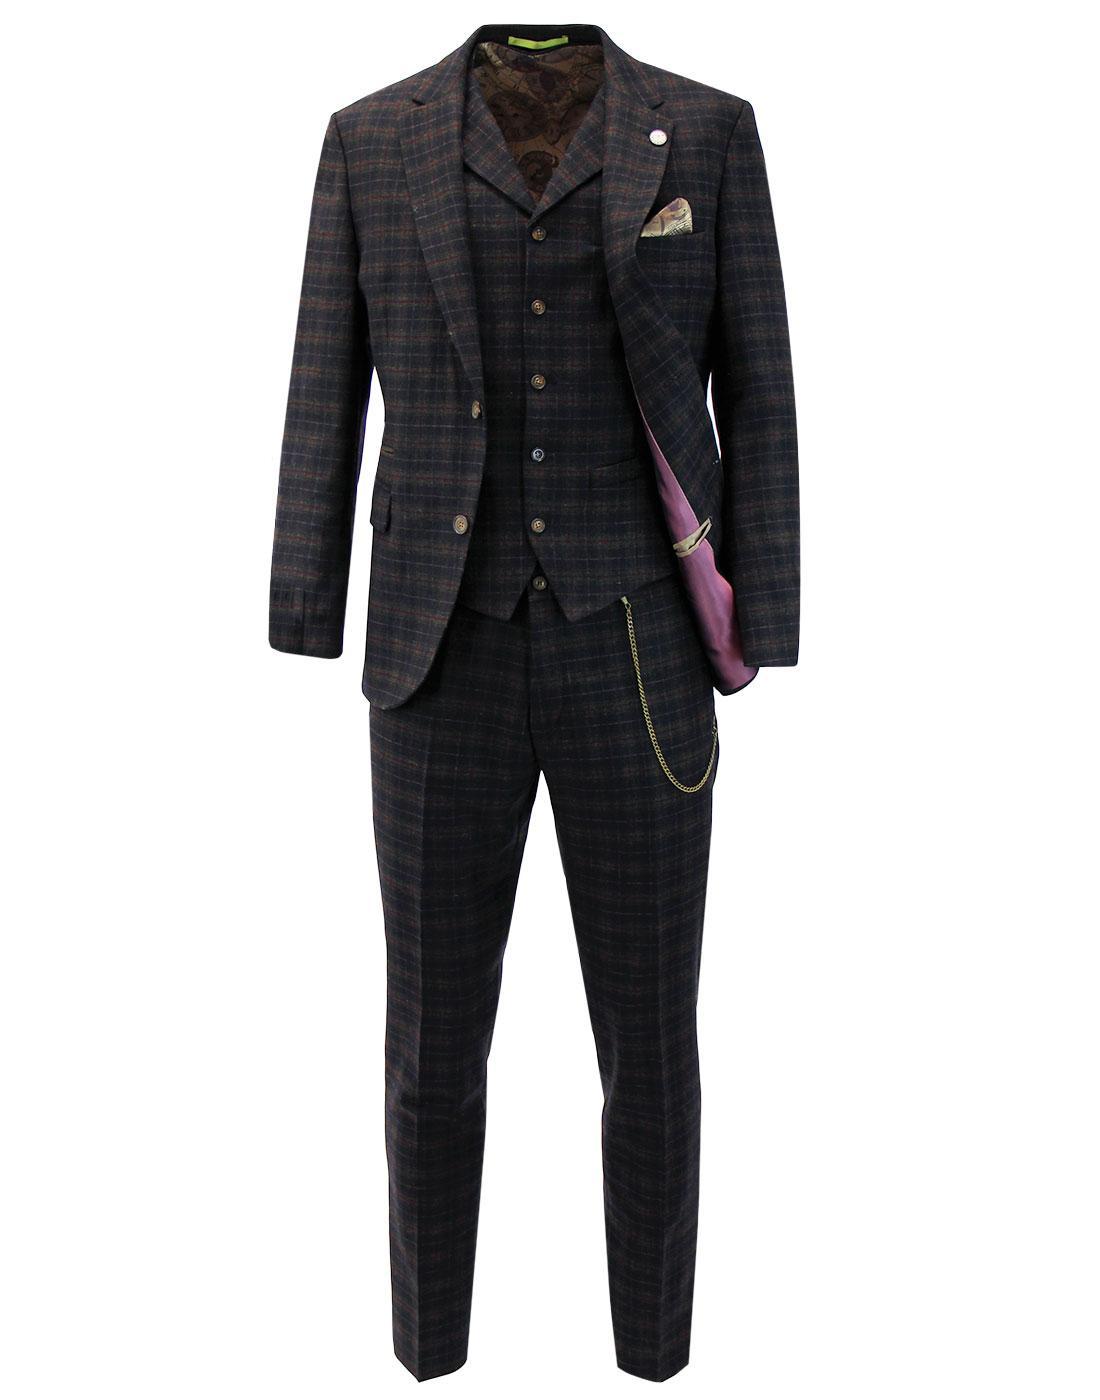 Towergate GIBSON LONDON Tartan 2 or 3 Piece Suit